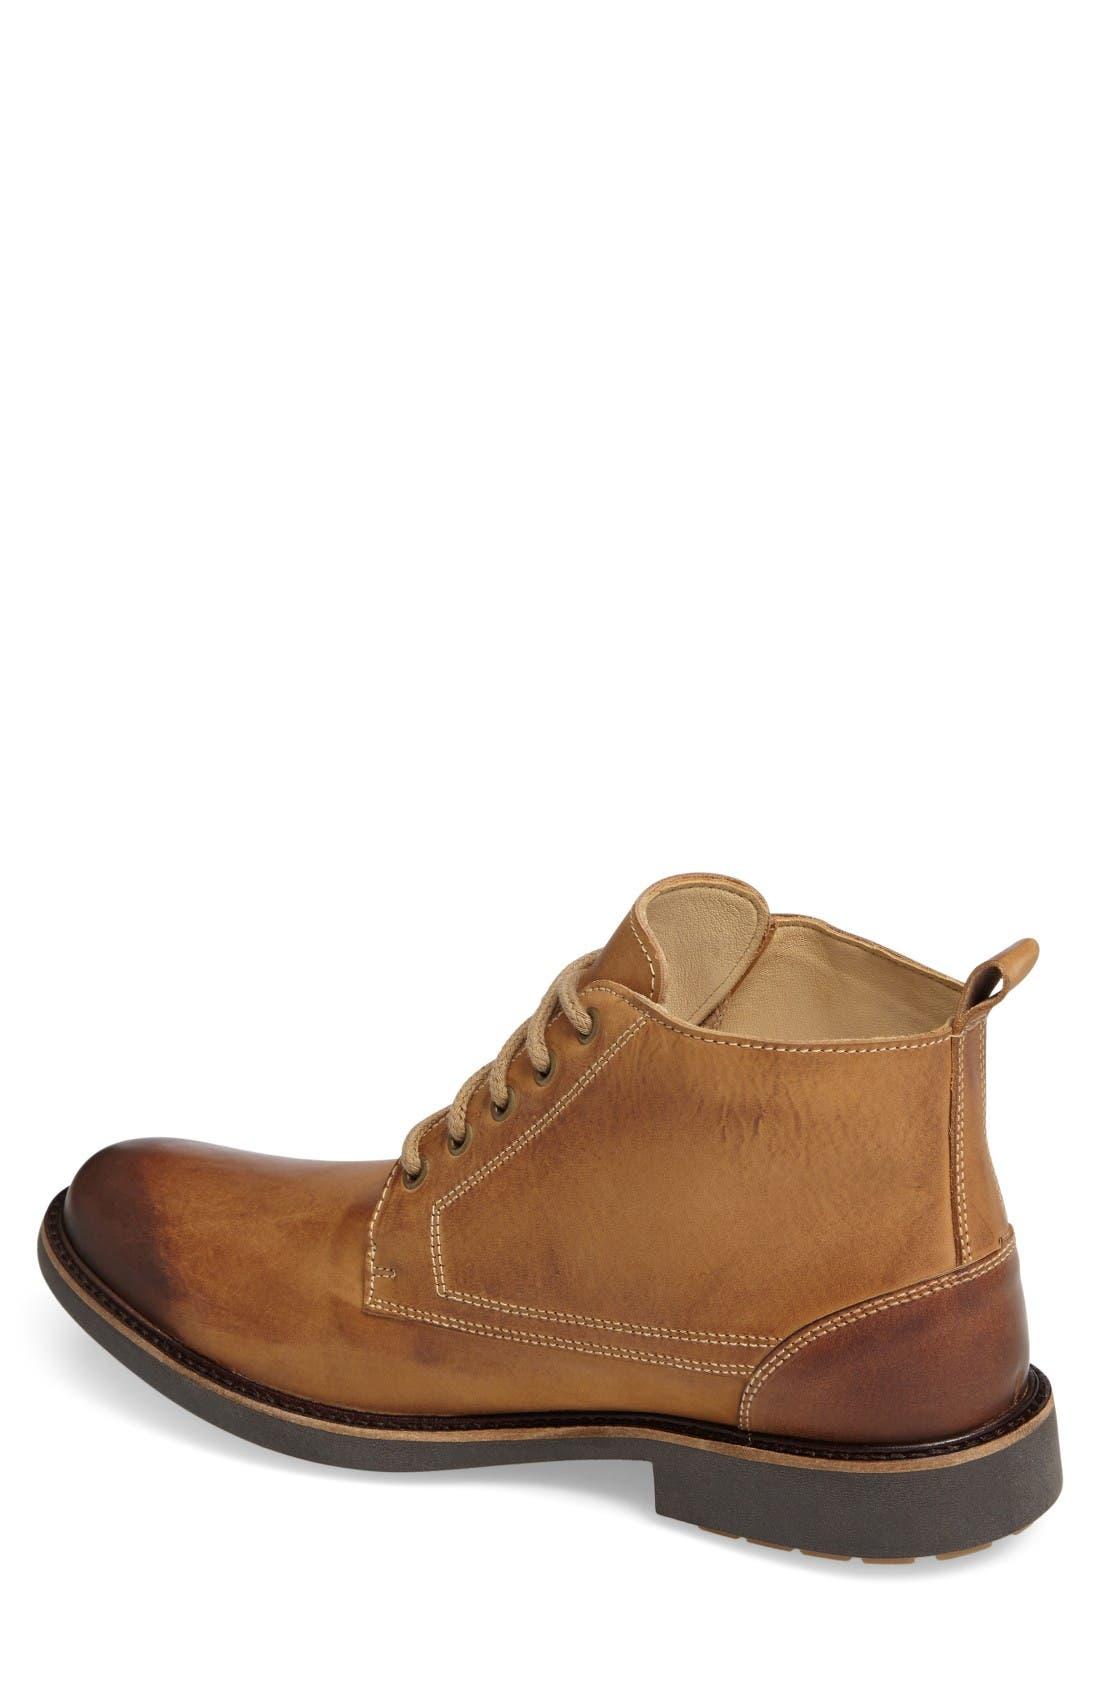 'Pedras' Boot,                             Alternate thumbnail 2, color,                             Castor Leather